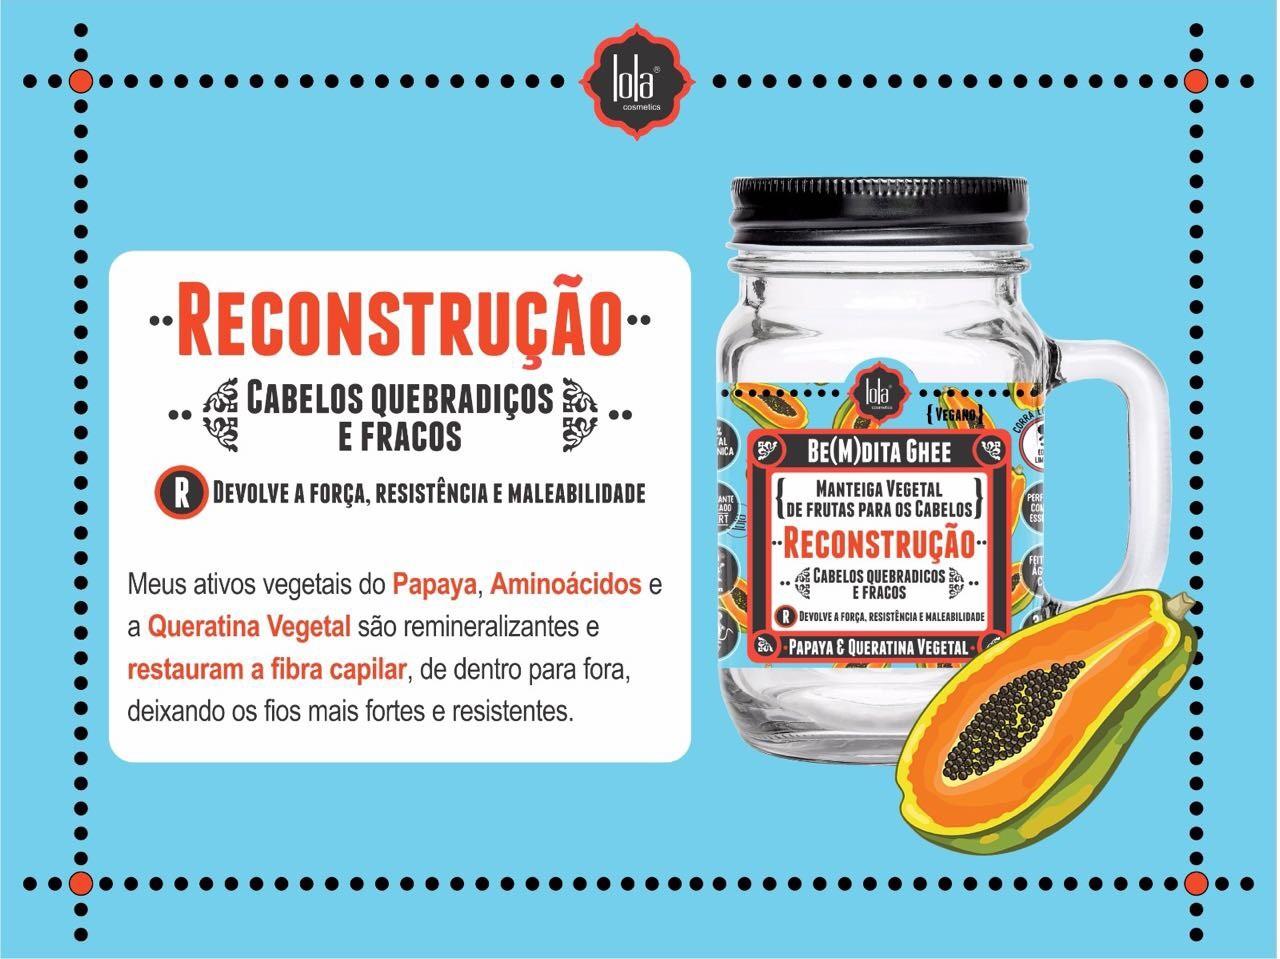 Lola Cosmetics Be(m)dita Ghee Papaya e Queratina Vegetal Máscara de Reconstrução 350g